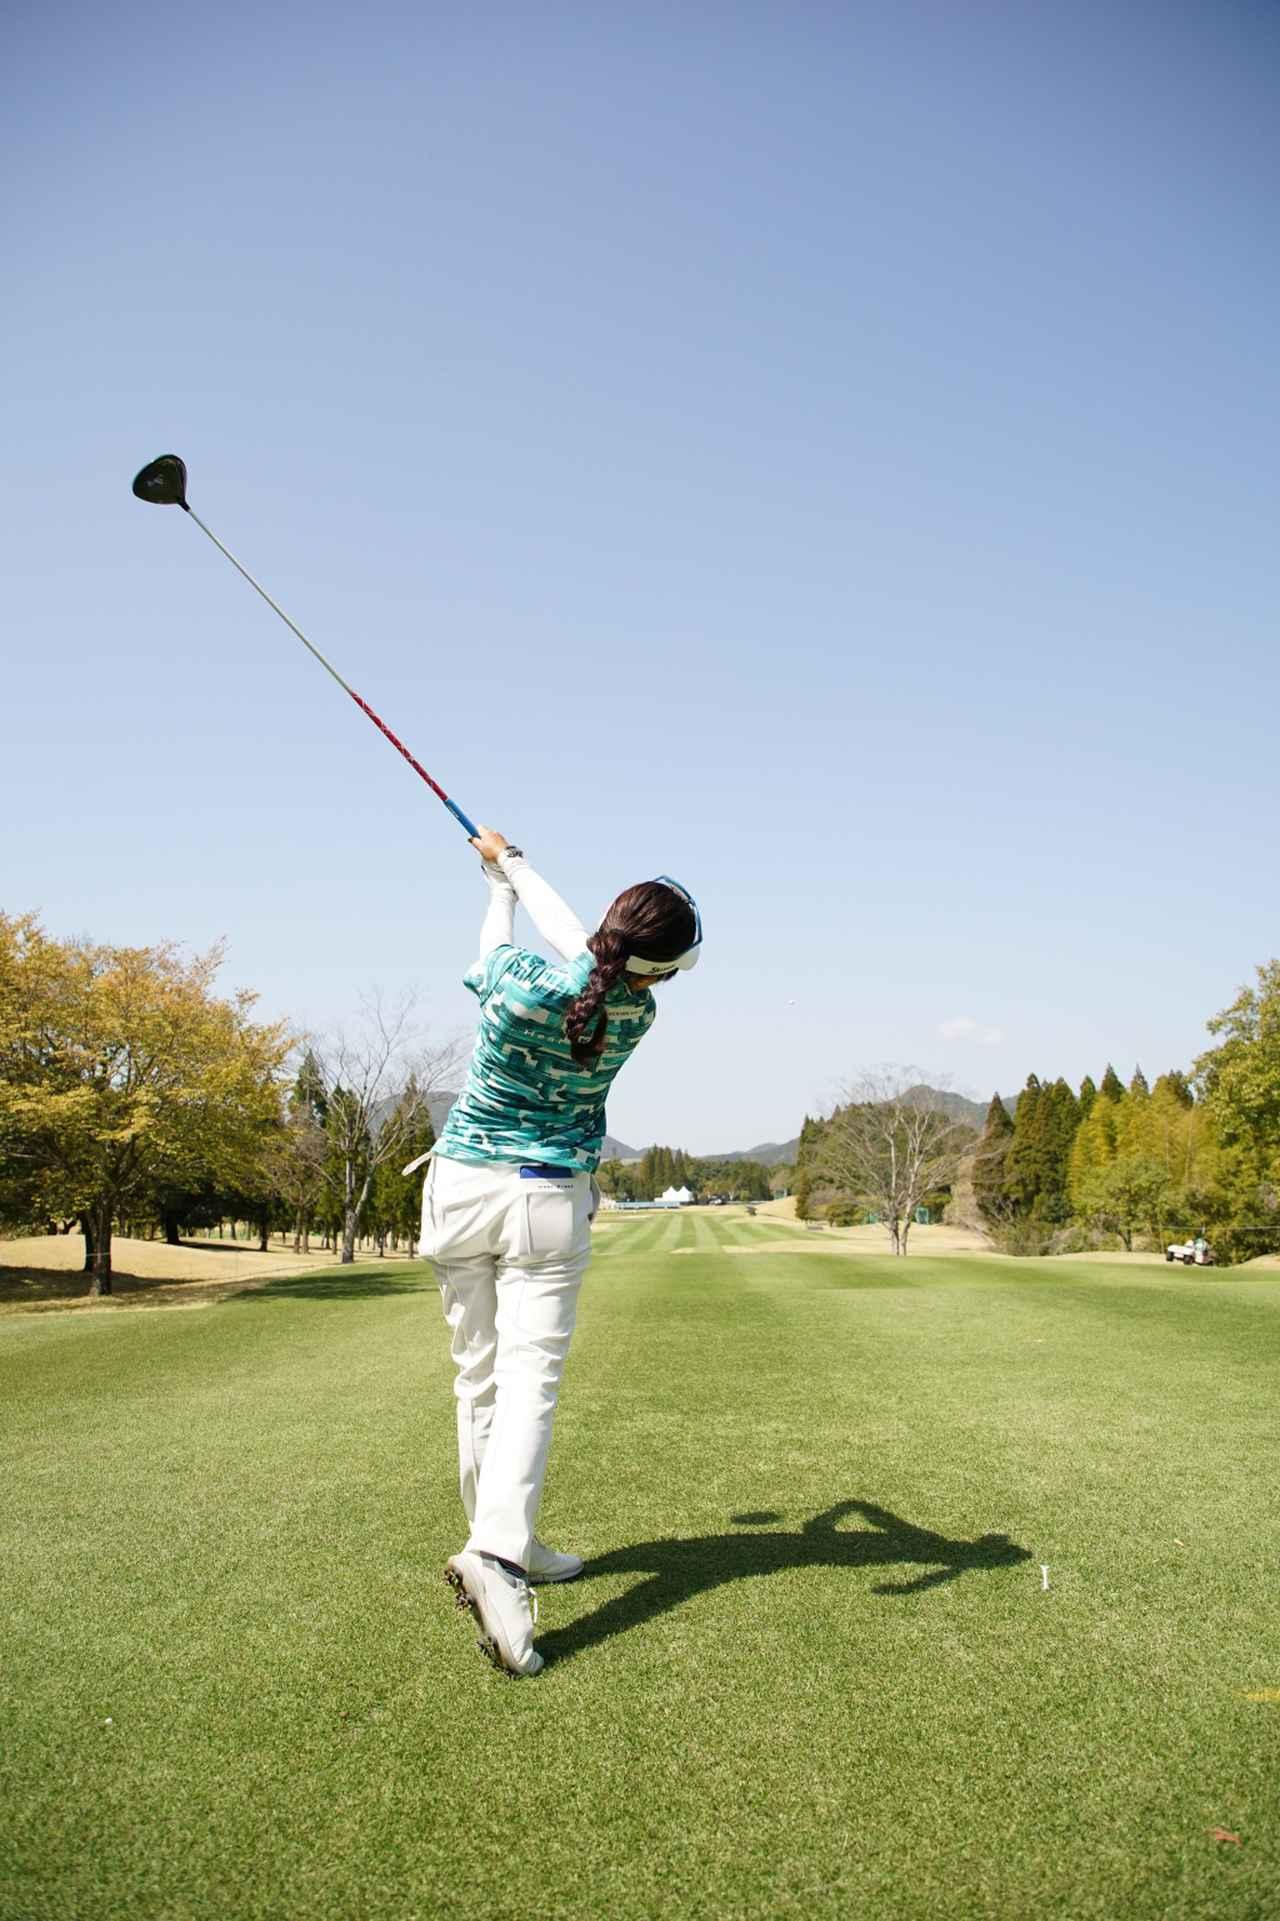 Images : 15番目の画像 - 青木瀬令奈のドライバー連続写真(後方) - みんなのゴルフダイジェスト